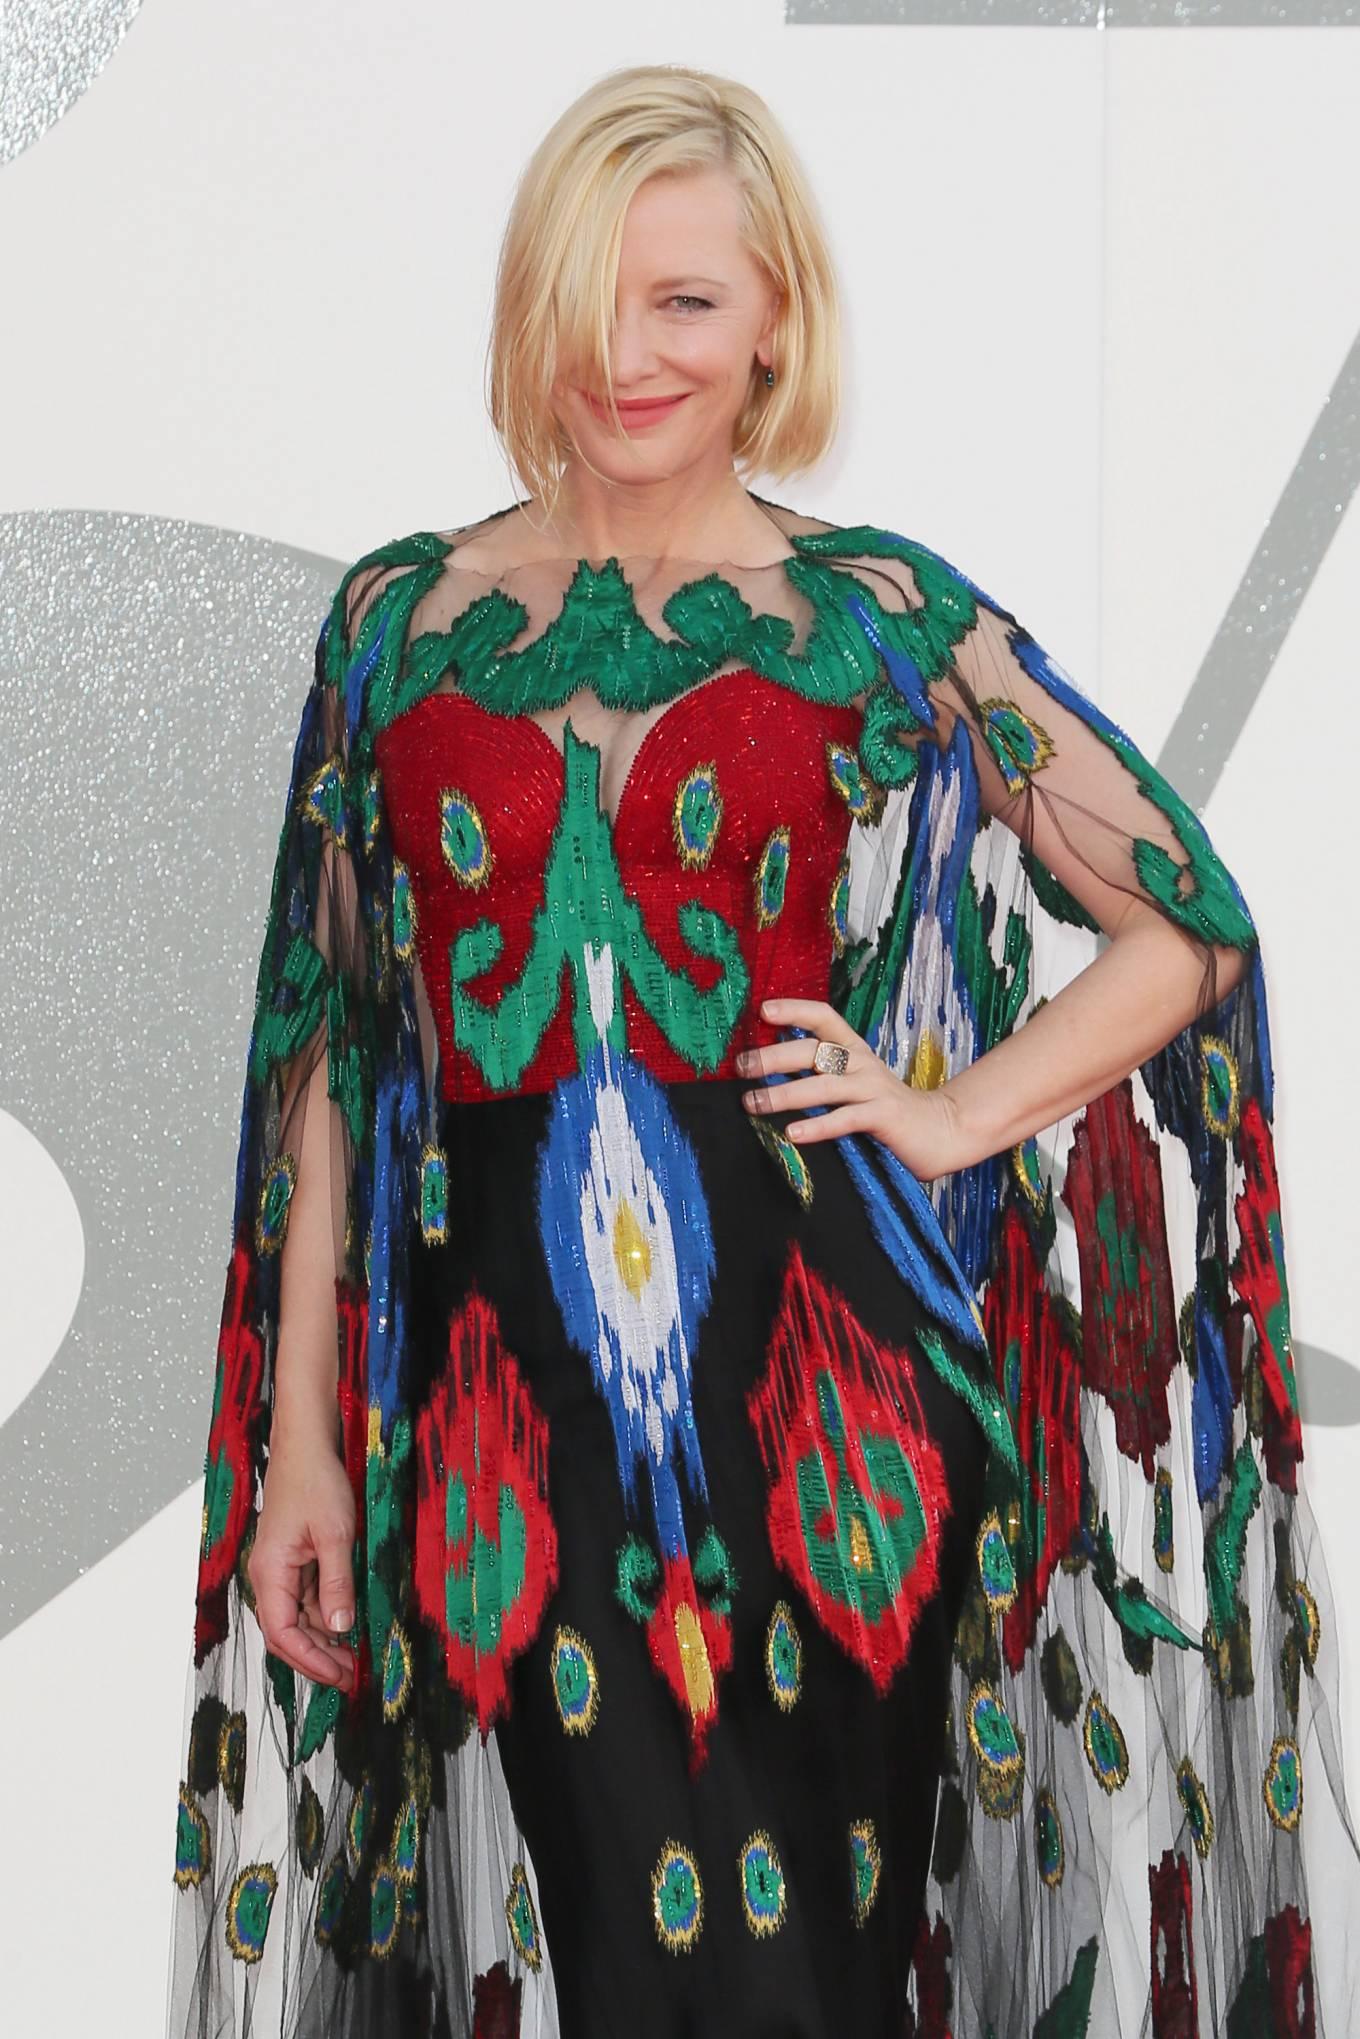 Cate Blanchett 2020 : Cate Blanchett – Closing Ceremony Red Carpet of 2020 Venice Film Festival in Venice-10